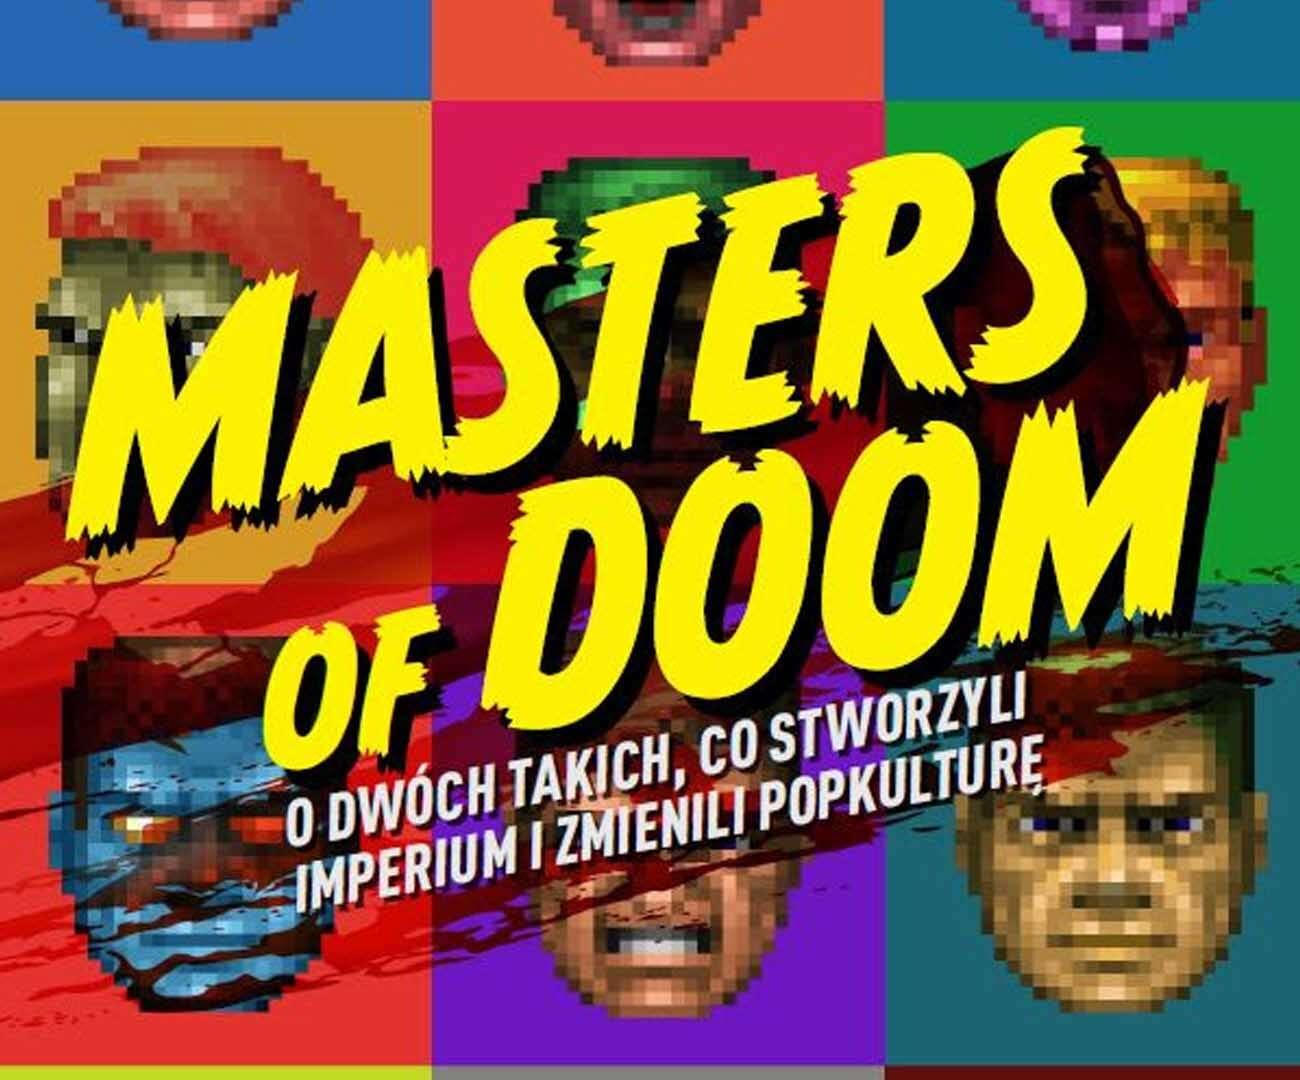 masters of doom, david kushner